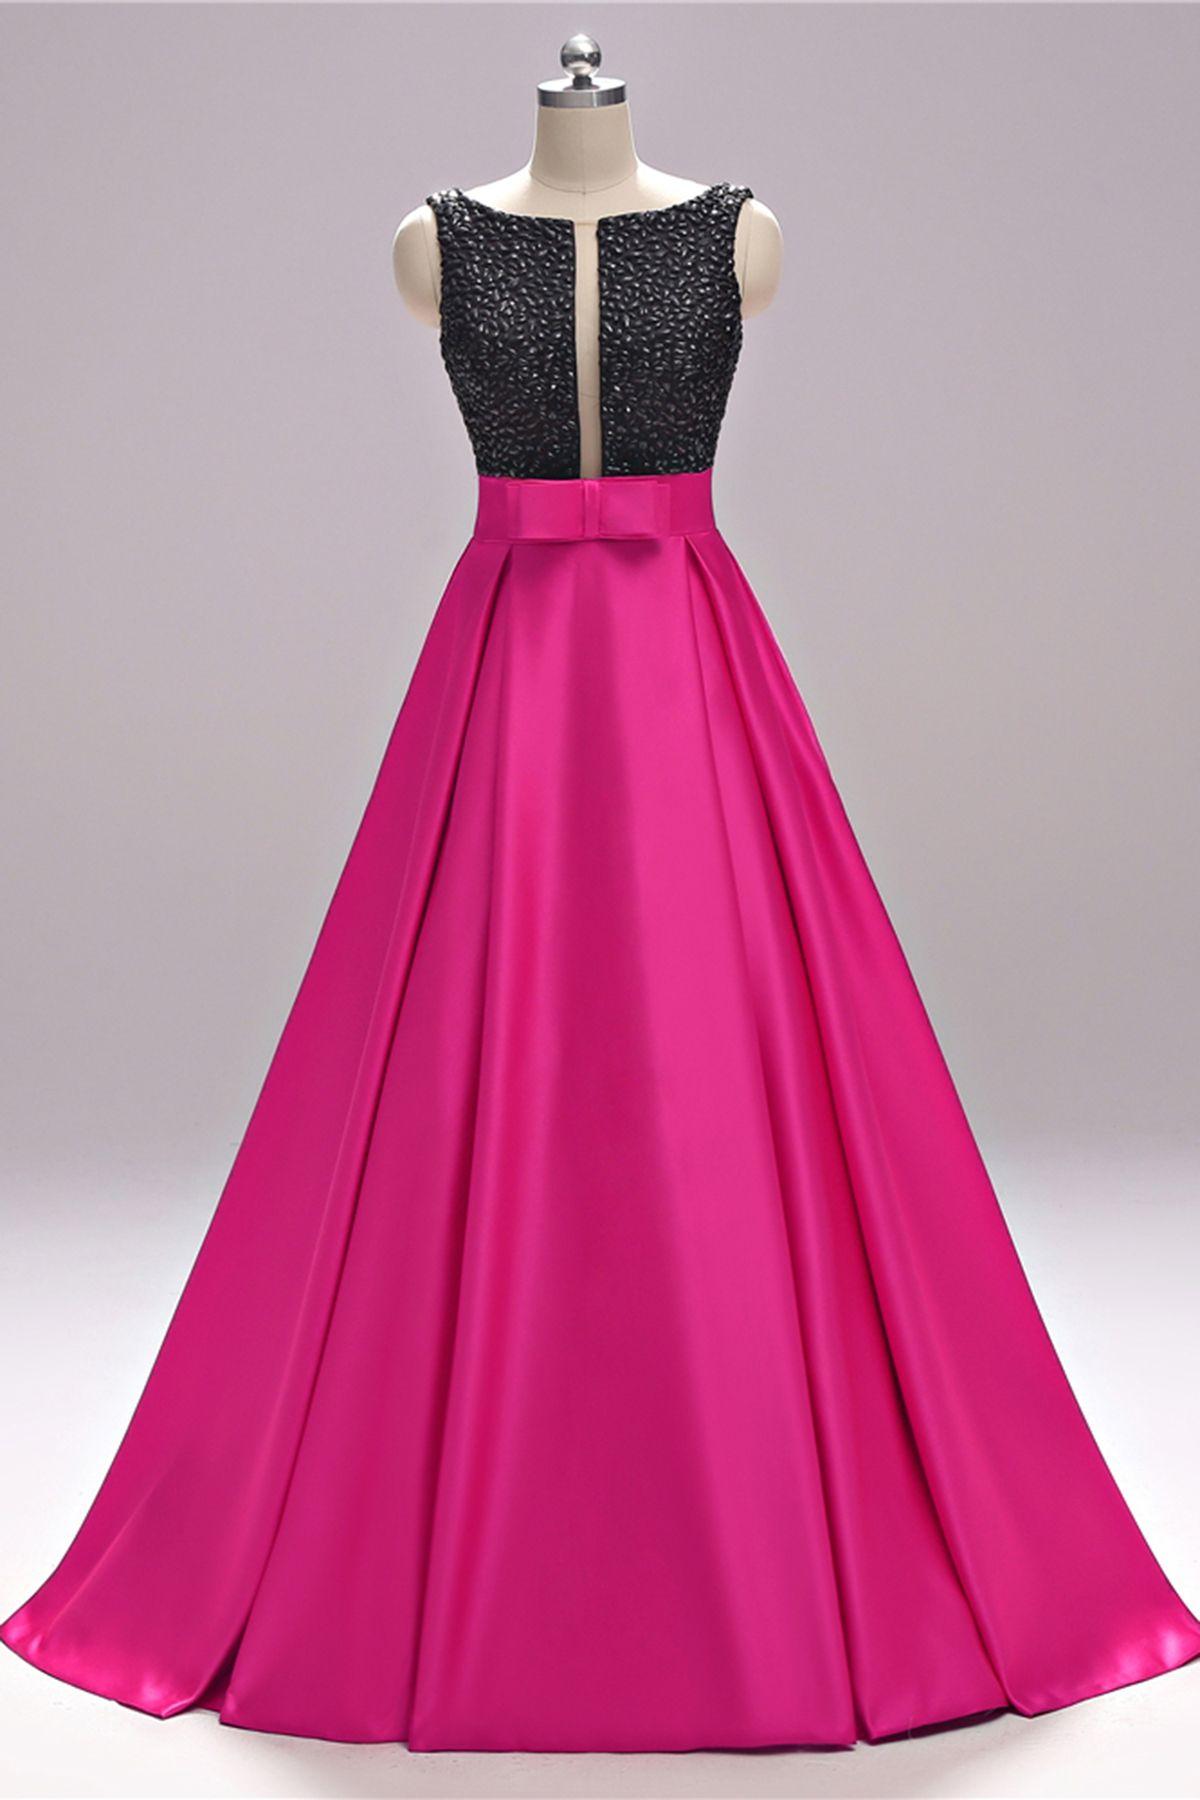 Rosy satin round neck black beaded open back long prom dress halter